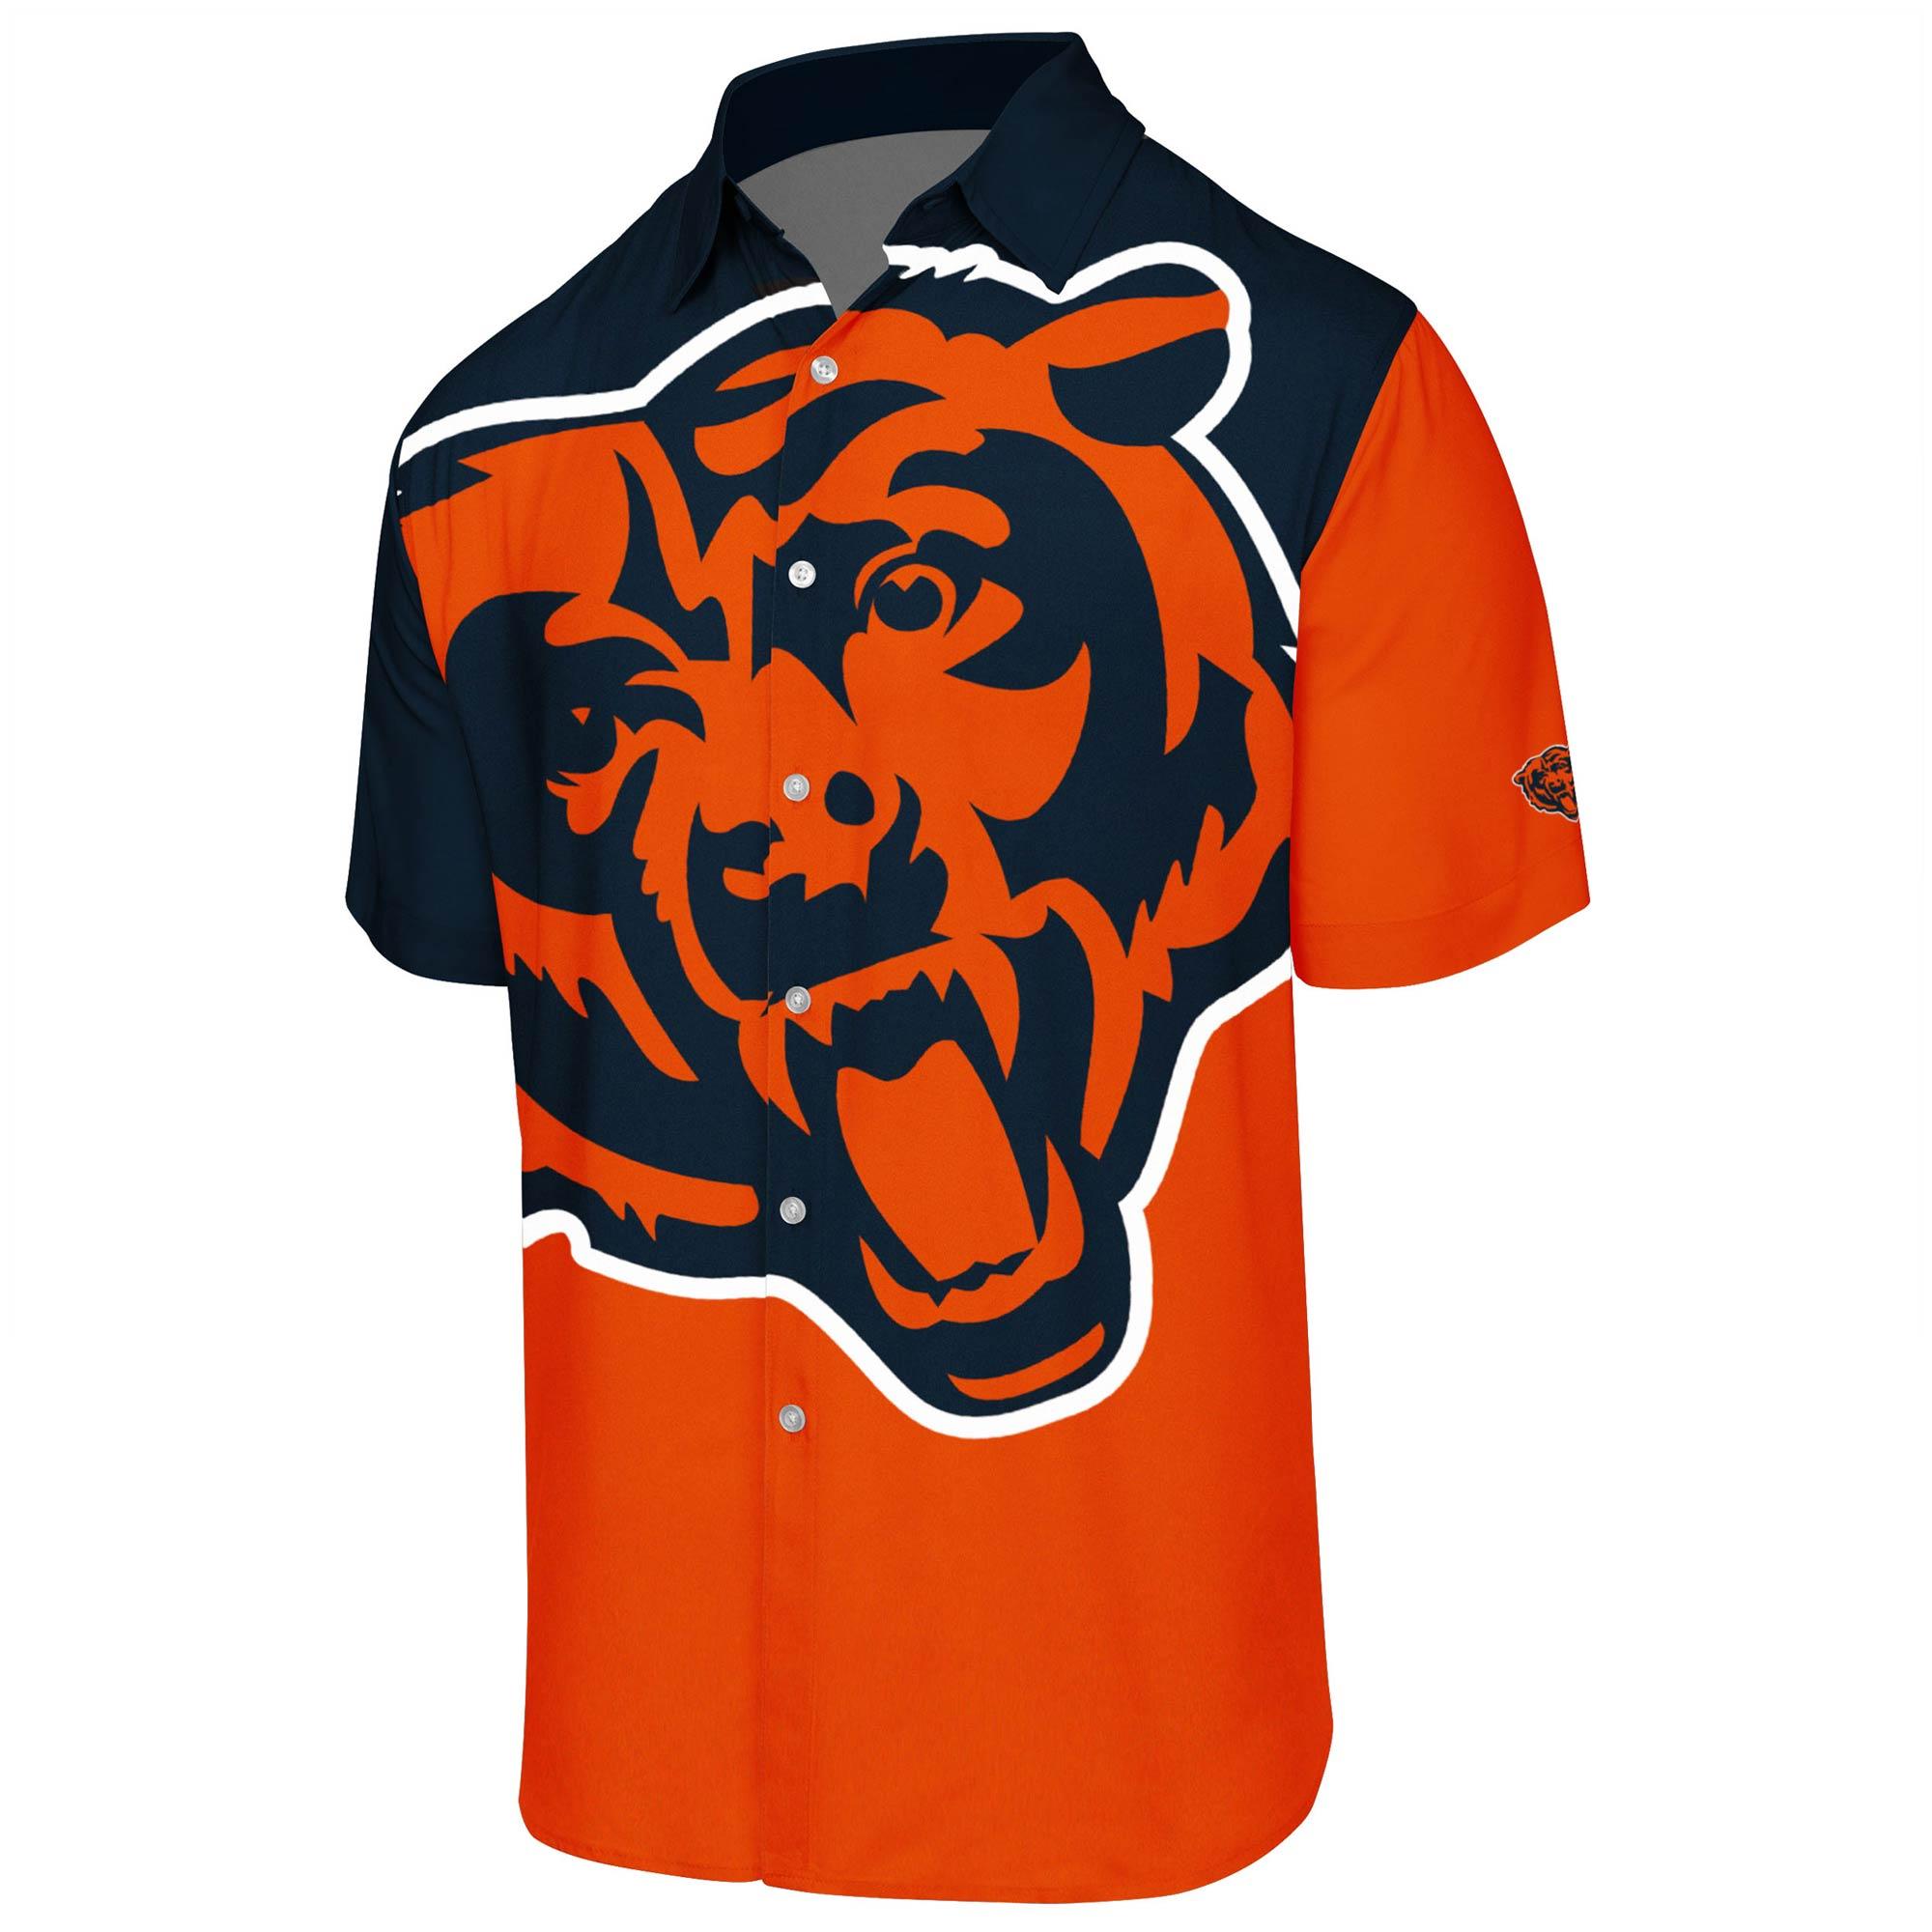 Chicago Bears Big Logo Button-Up Woven T-Shirt - Orange